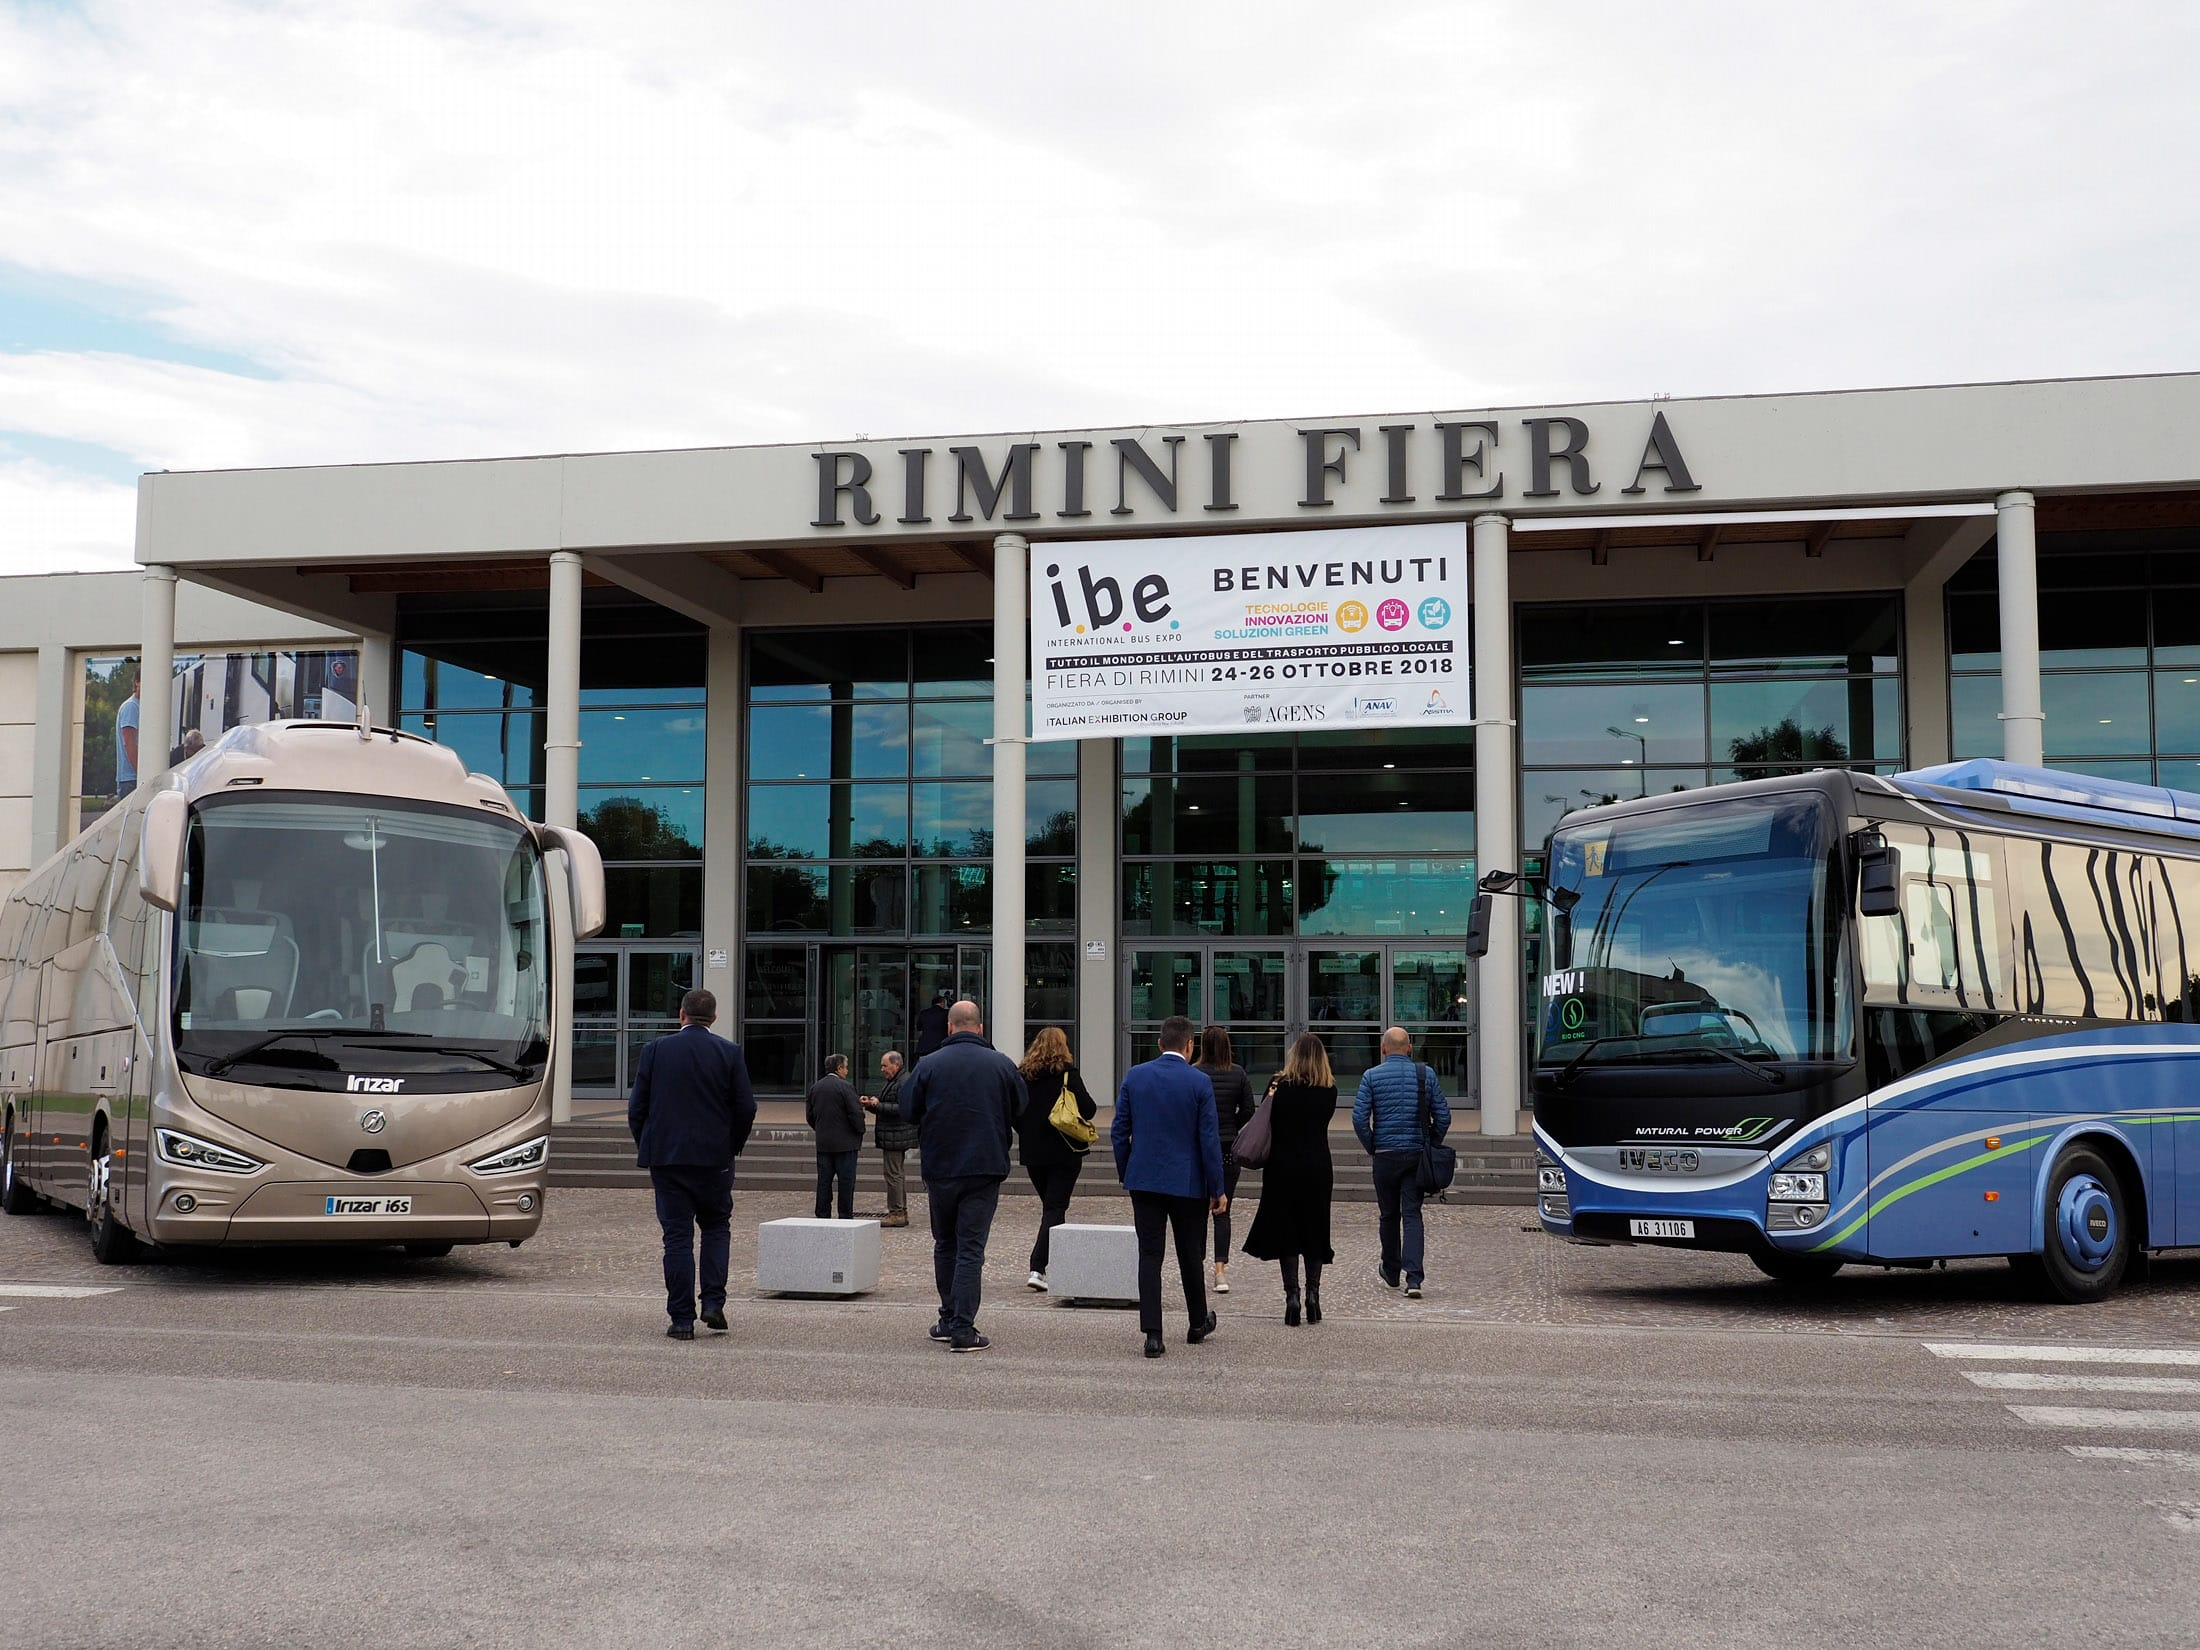 ibe 2020 autobus rimini fiera